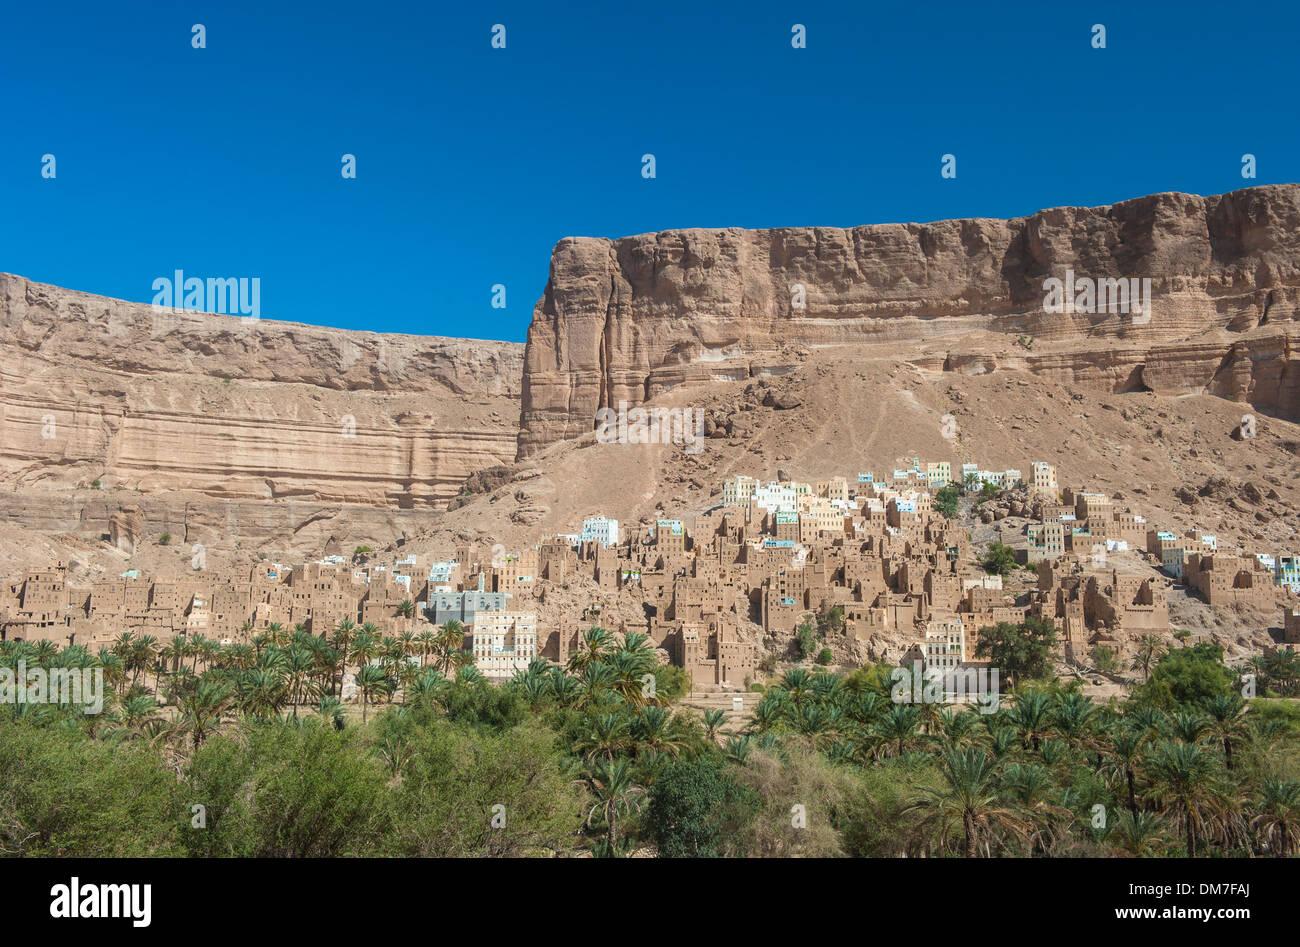 Mud town in Wadi Doan, Hadramaut province, Yemen - Stock Image